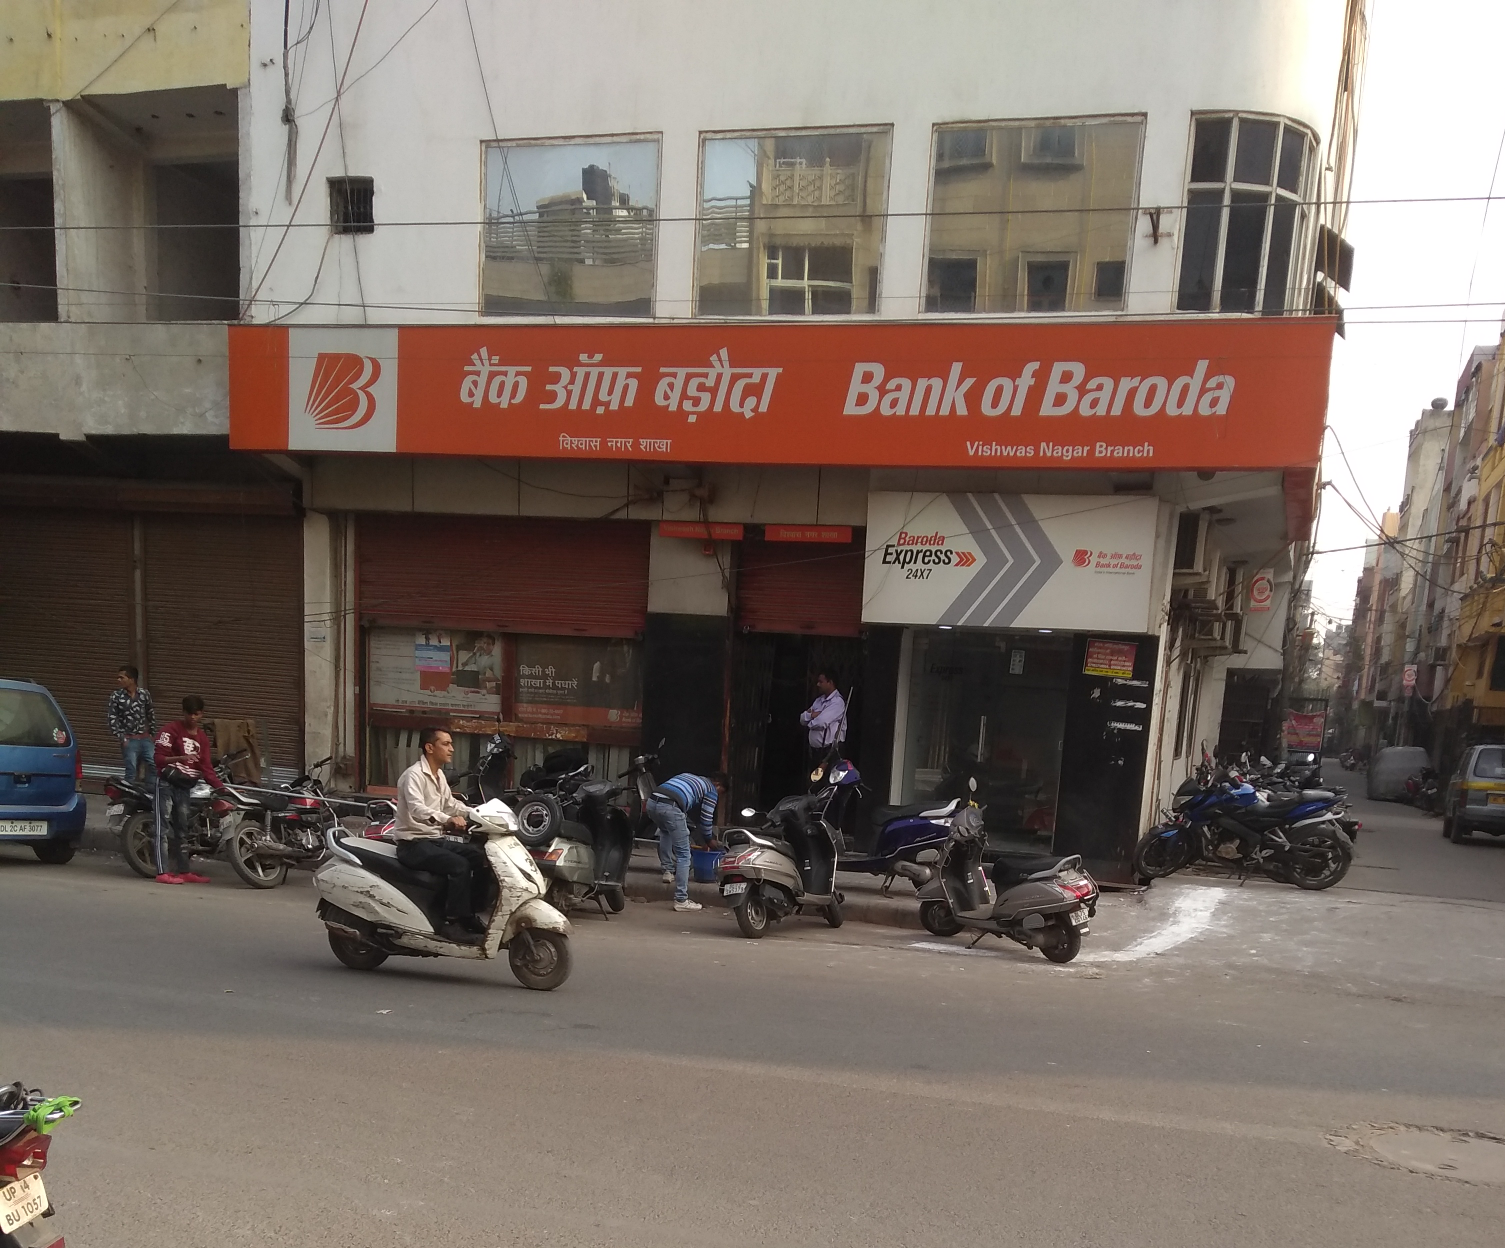 blood bank Bank Of Baroda near Delhi Delhi